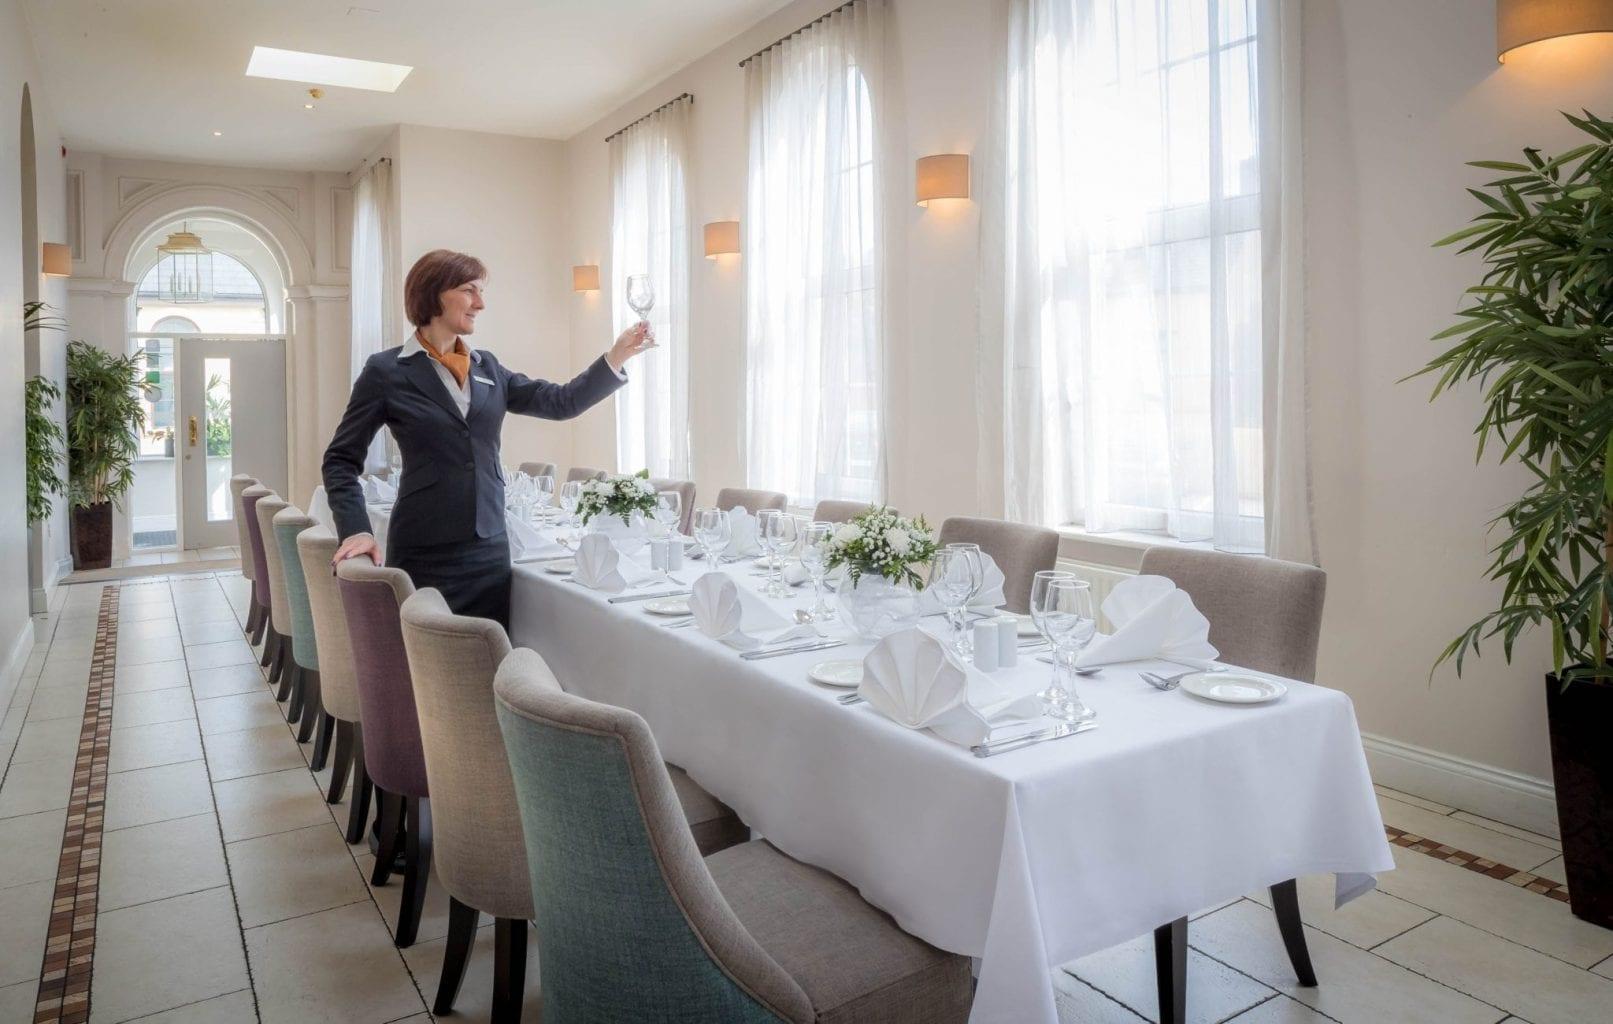 Celebrate special occasions private dining at Maldron Hotel Cork